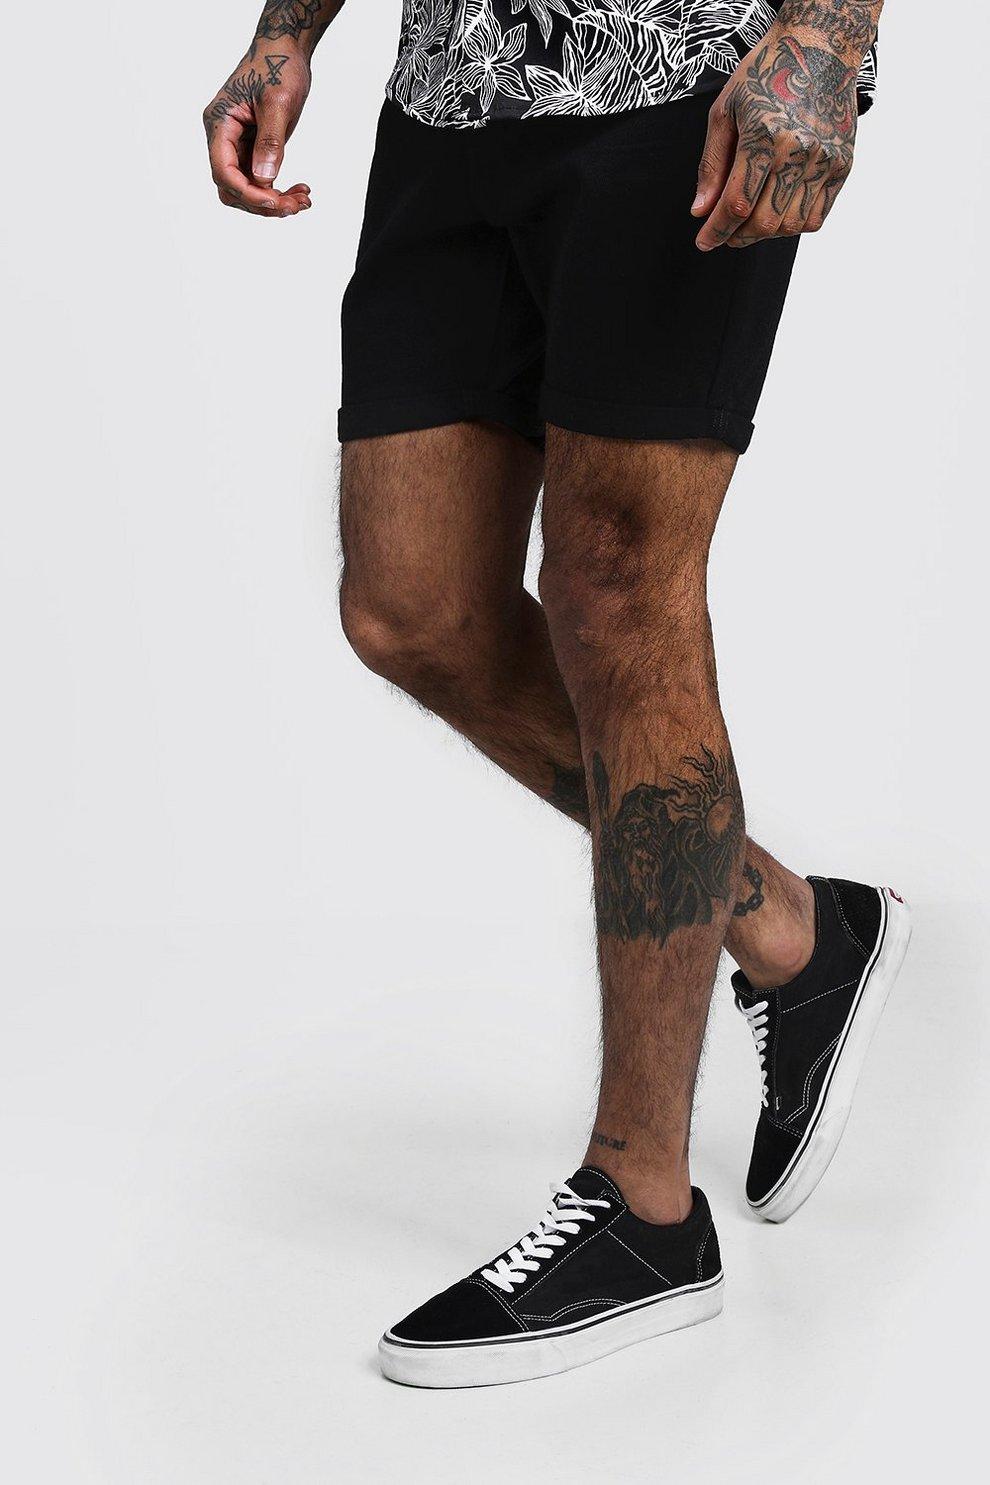 38555ed69a Mens Black Slim Fit Denim Shorts With Pintuck Detail